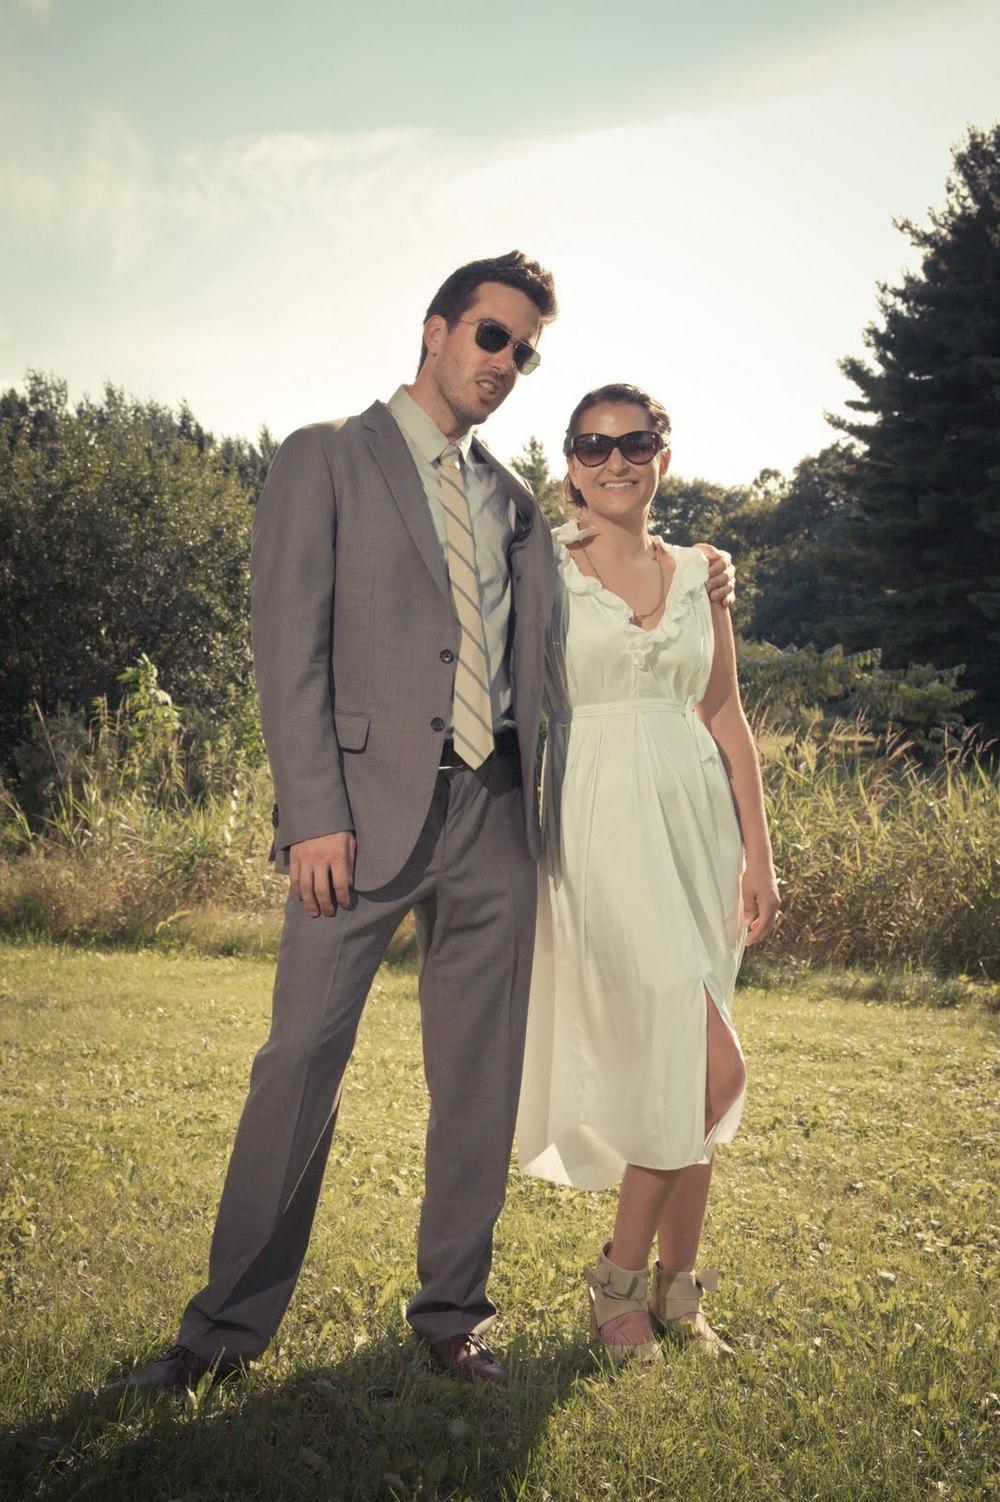 5_Forsberg_Bride_Groom_Sunglasses.jpg